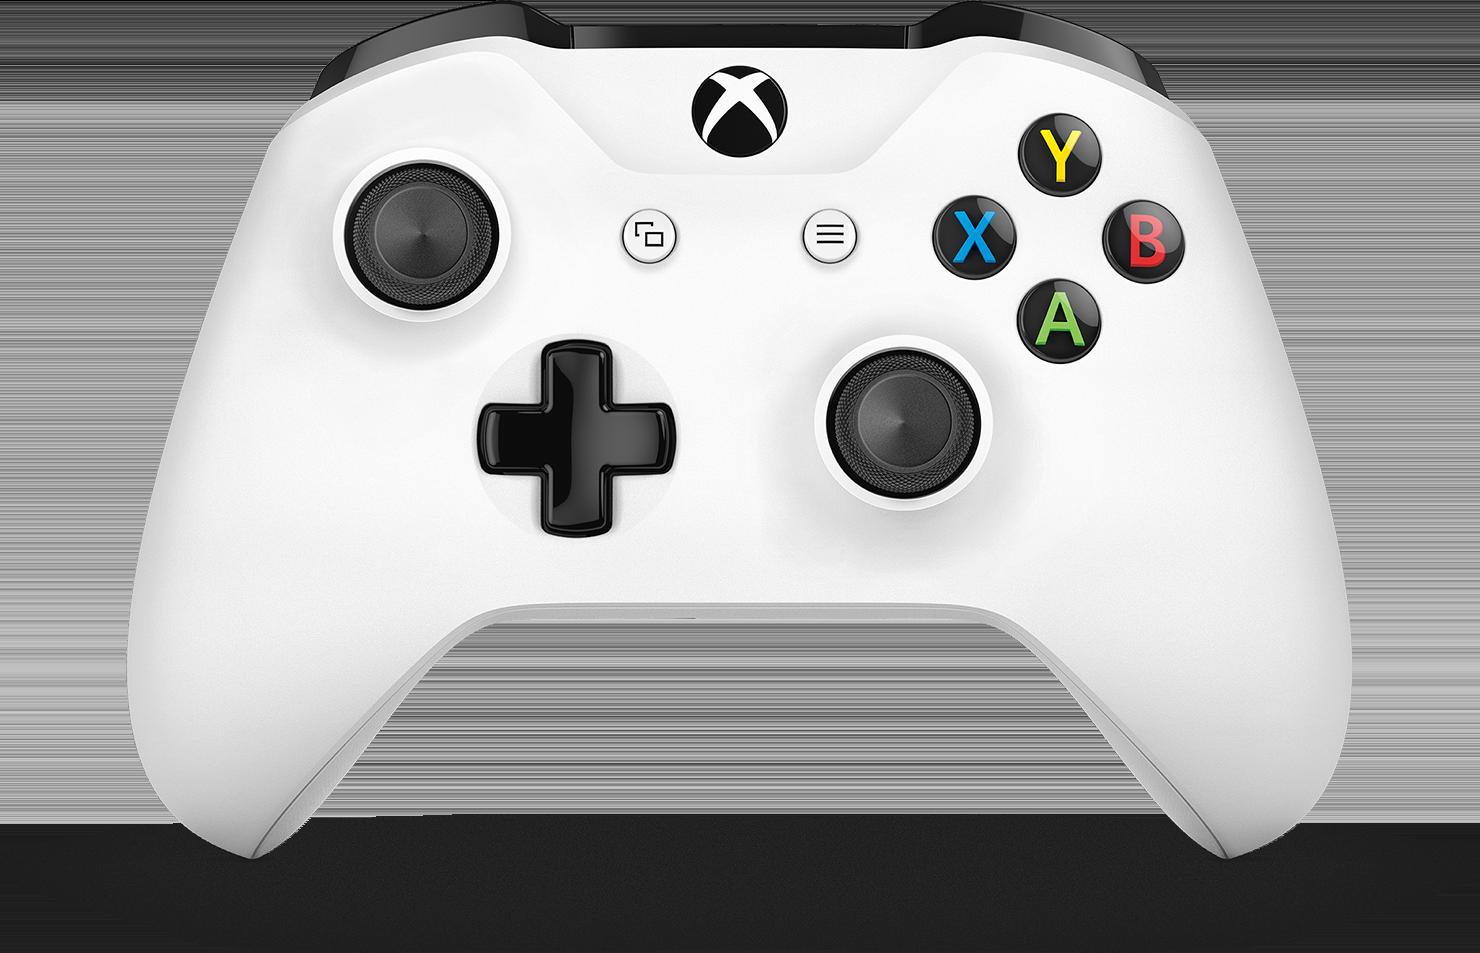 Xbox Wireless ControllerWhite - front view